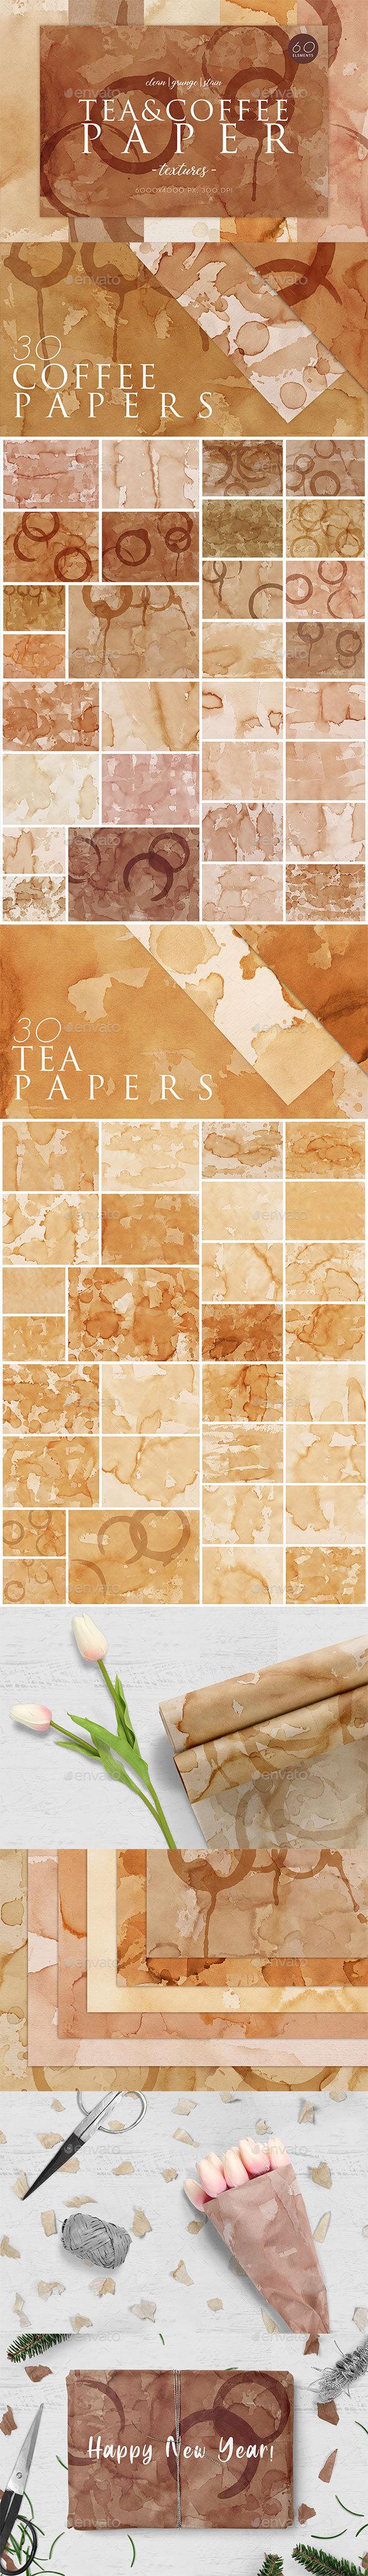 60 Tea&Coffee Stain Textures